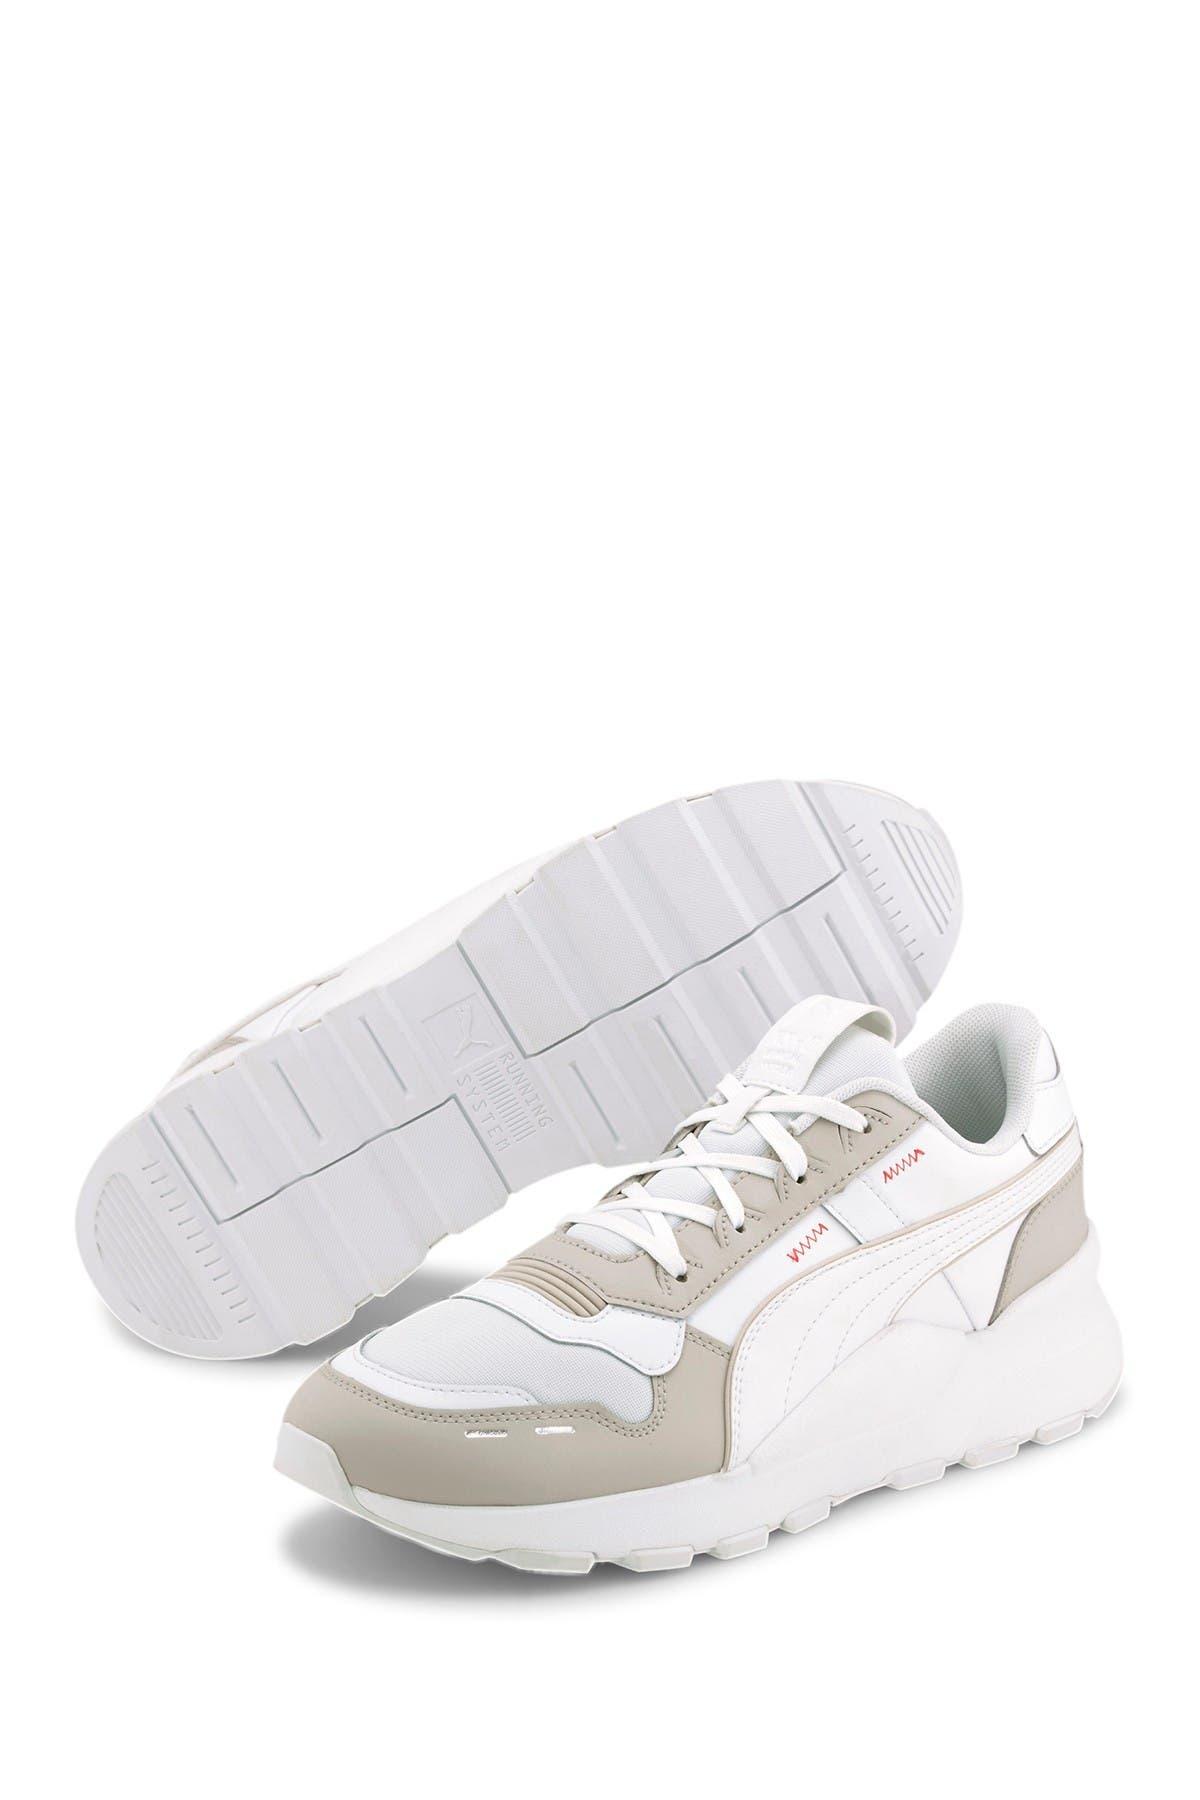 PUMA RS 2.0 Base Sneaker